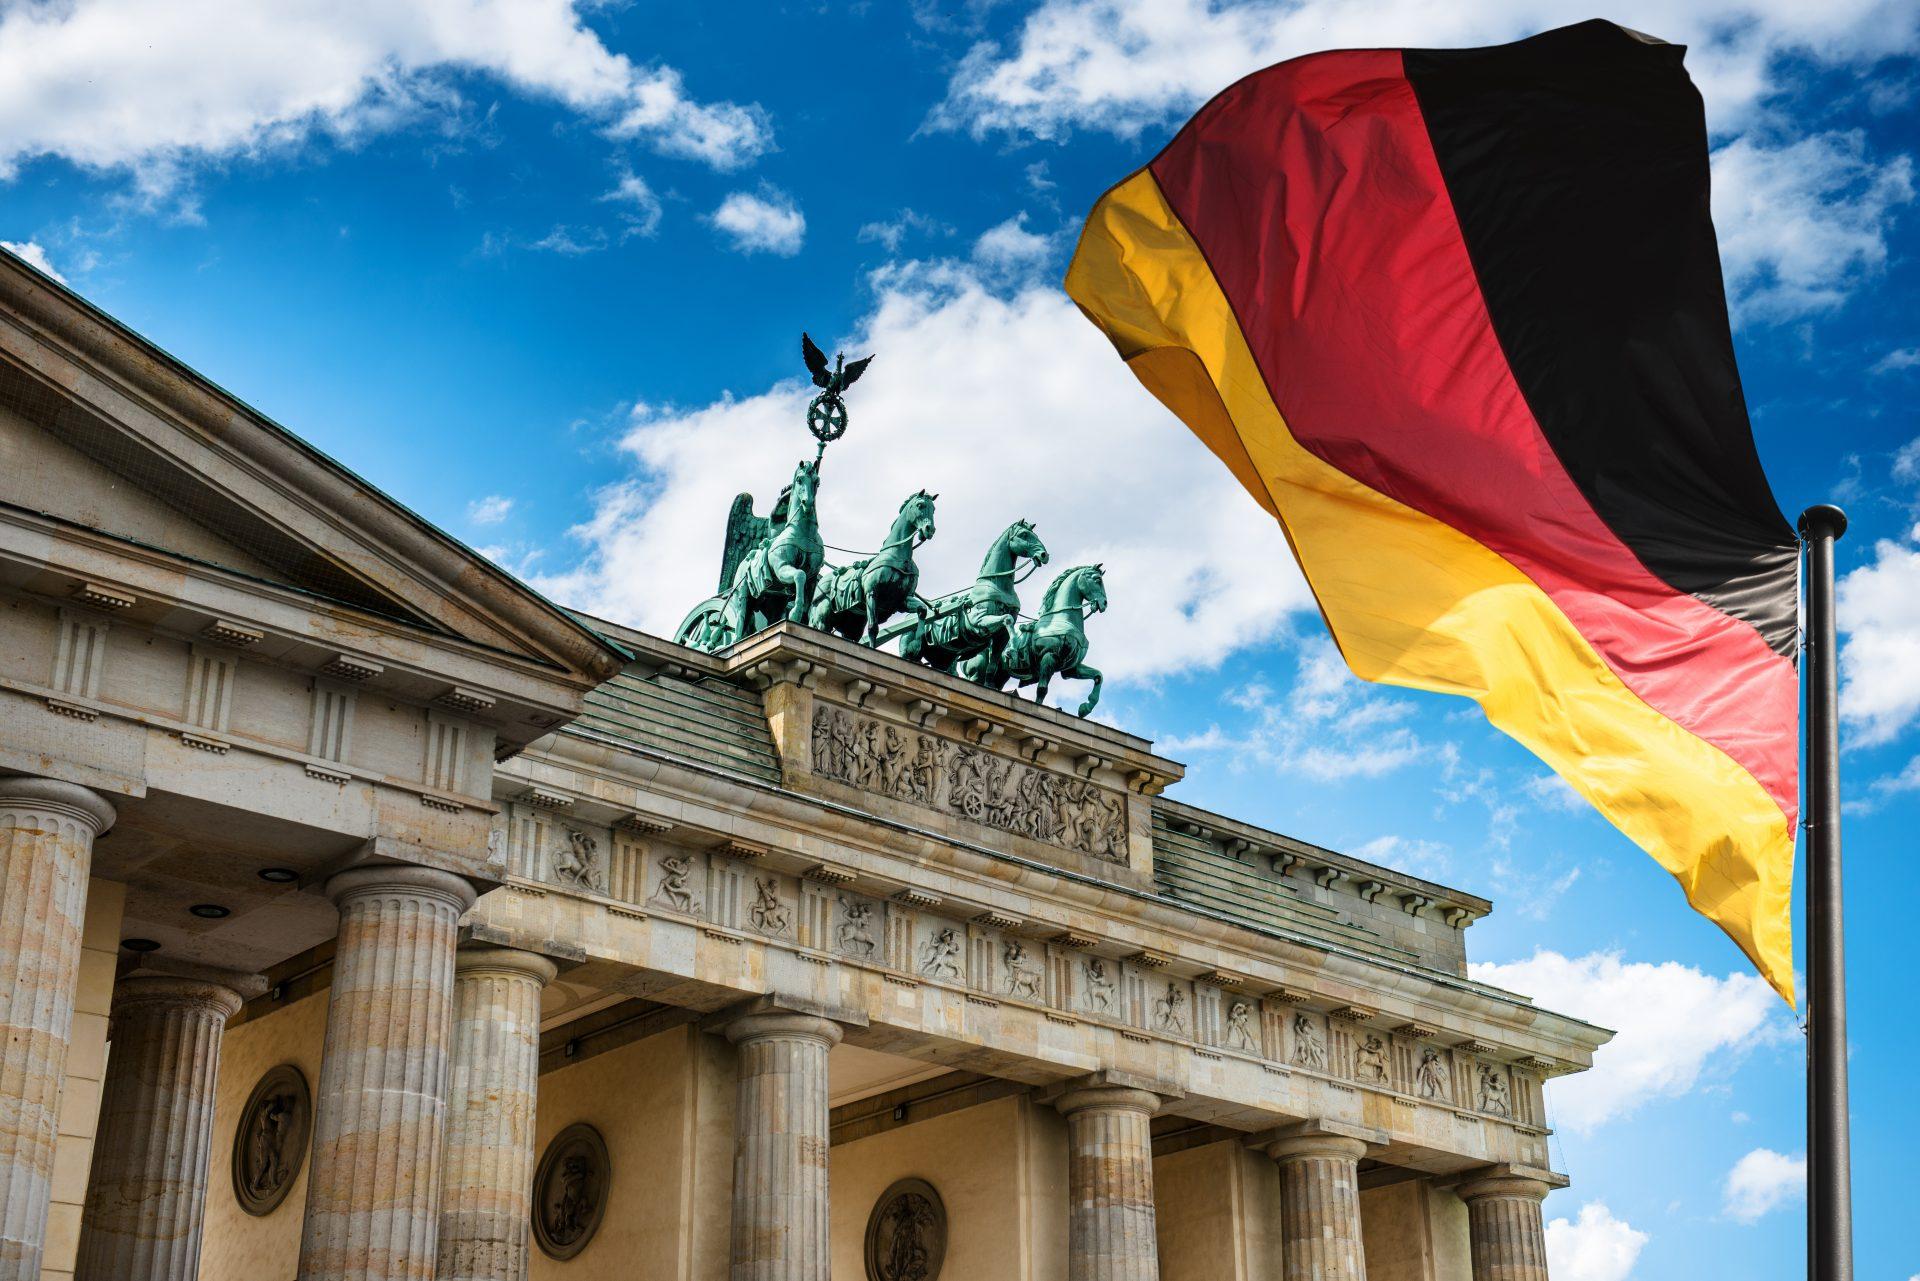 Deutschlandflagge vor dem Brandenburger Tor